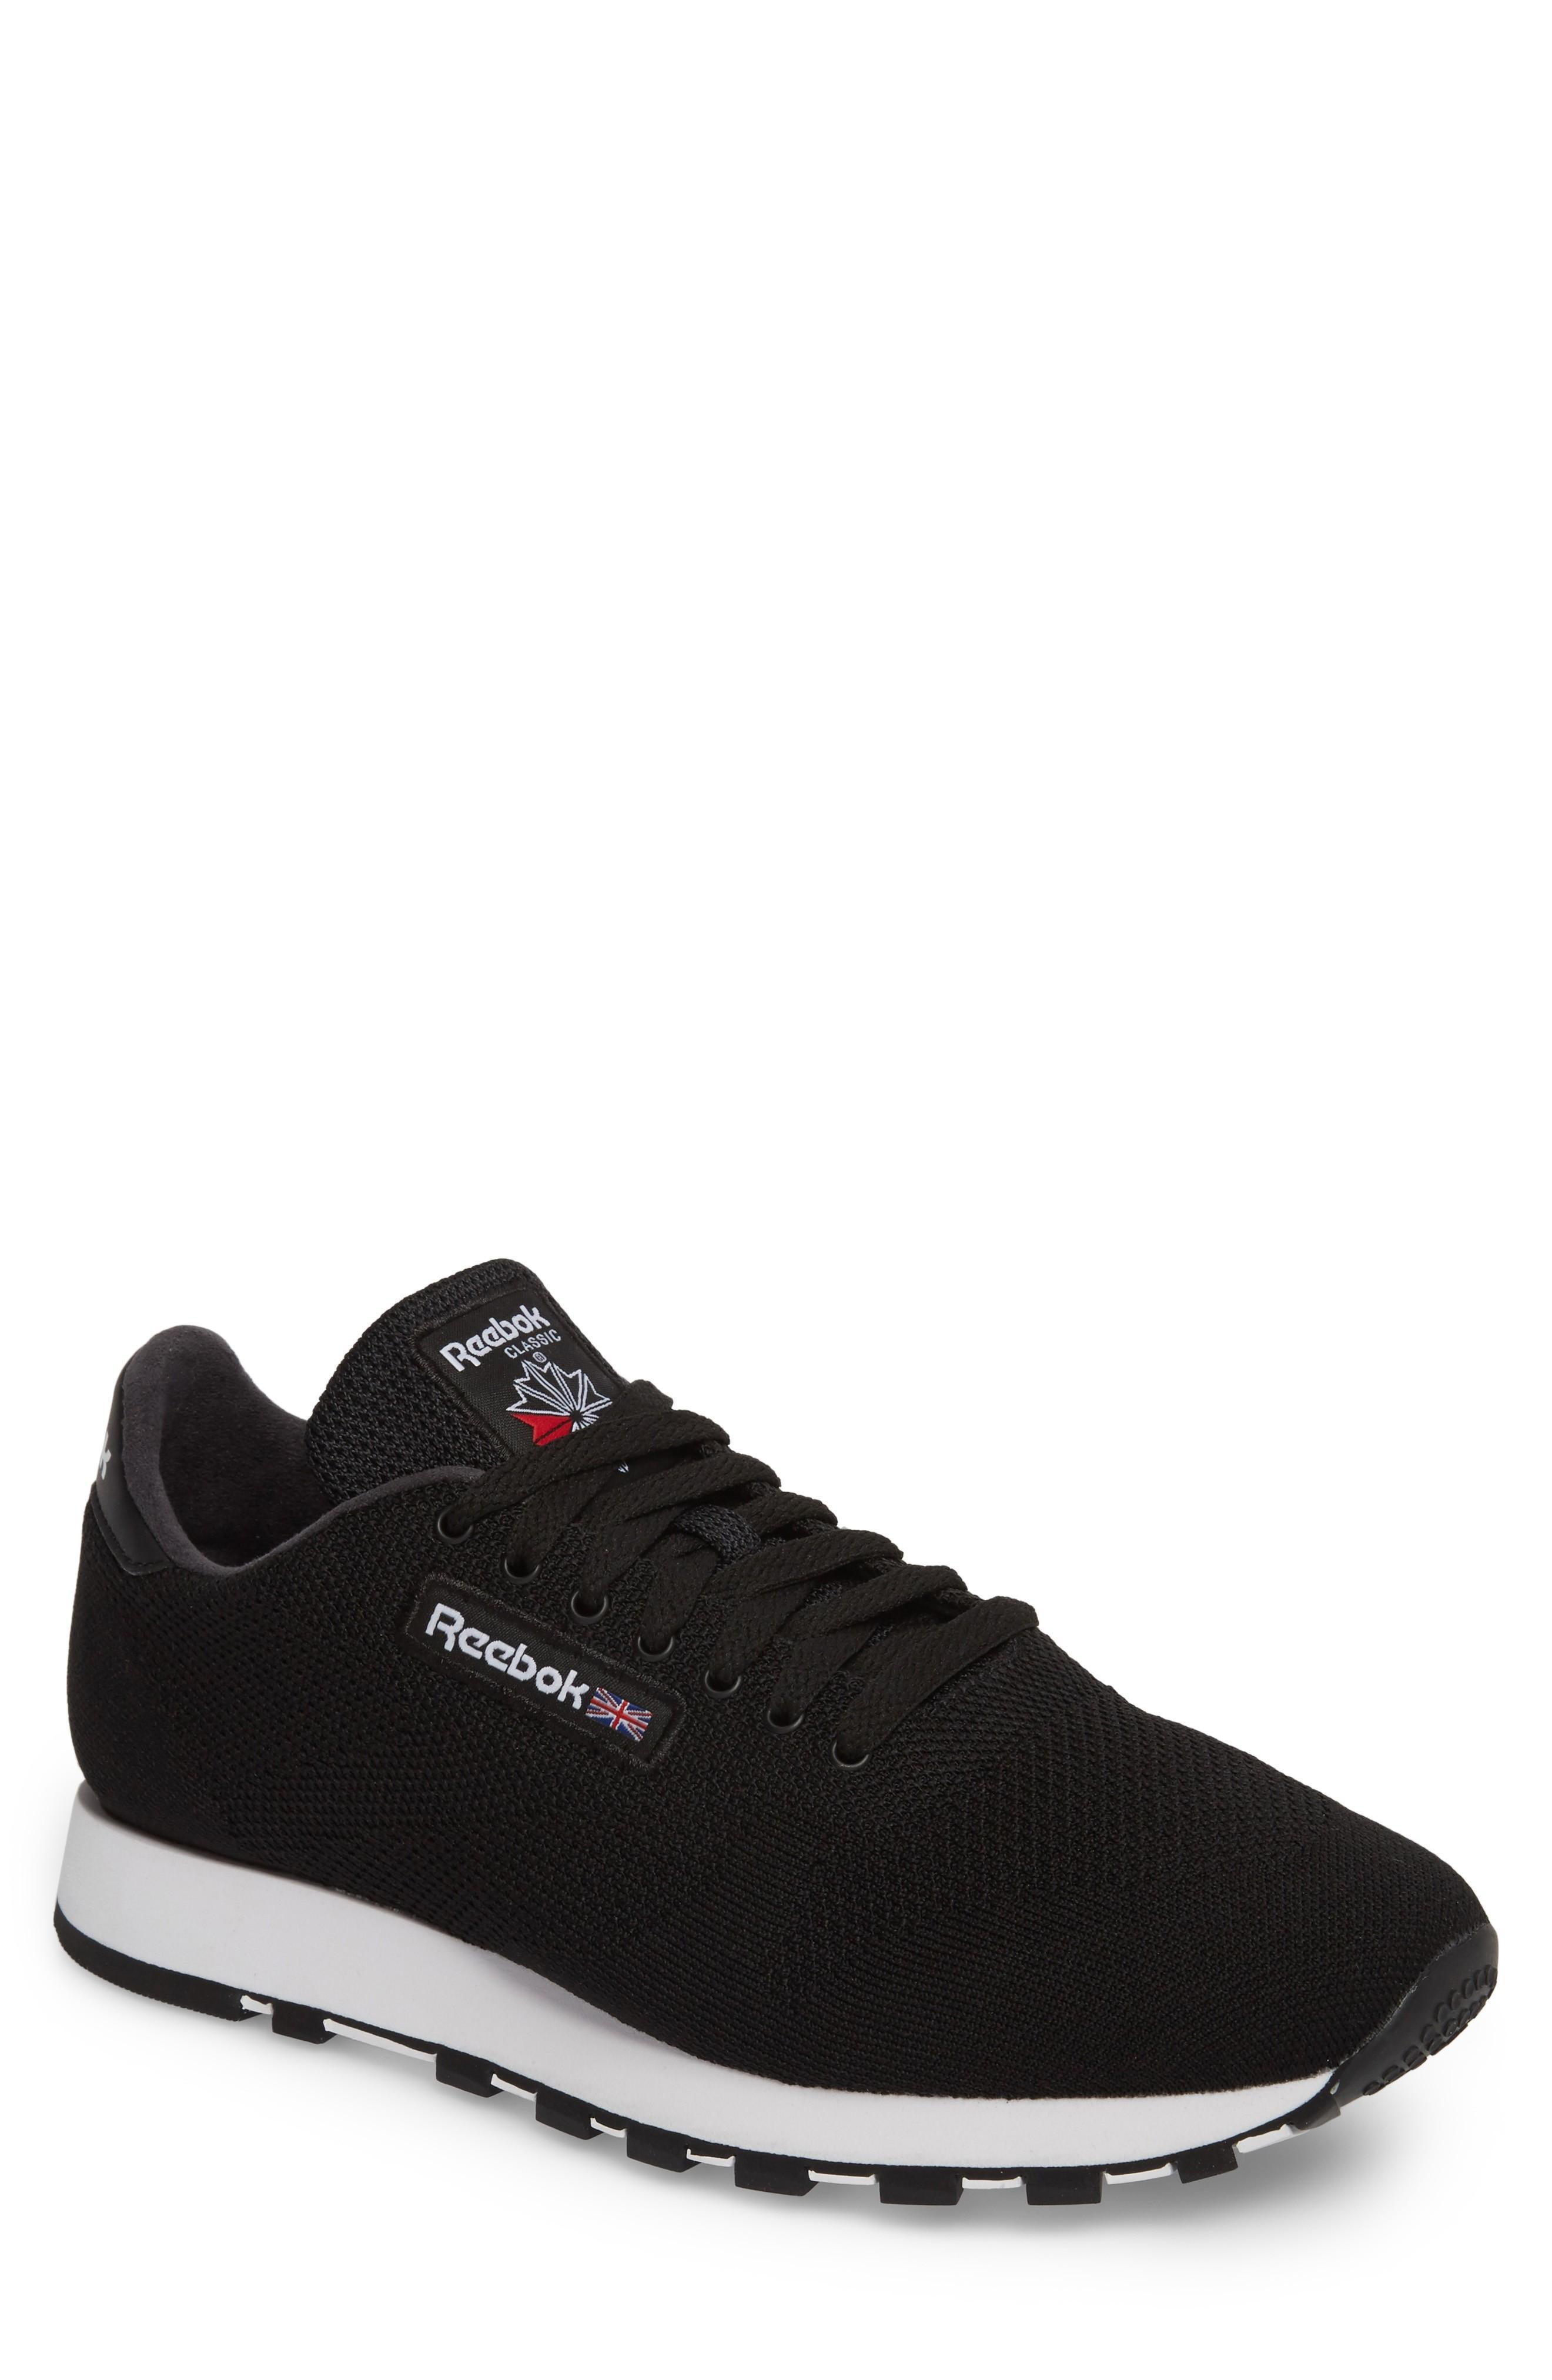 71cad2c8406 Reebok Classic Leather Ultk Sneaker In Black  White